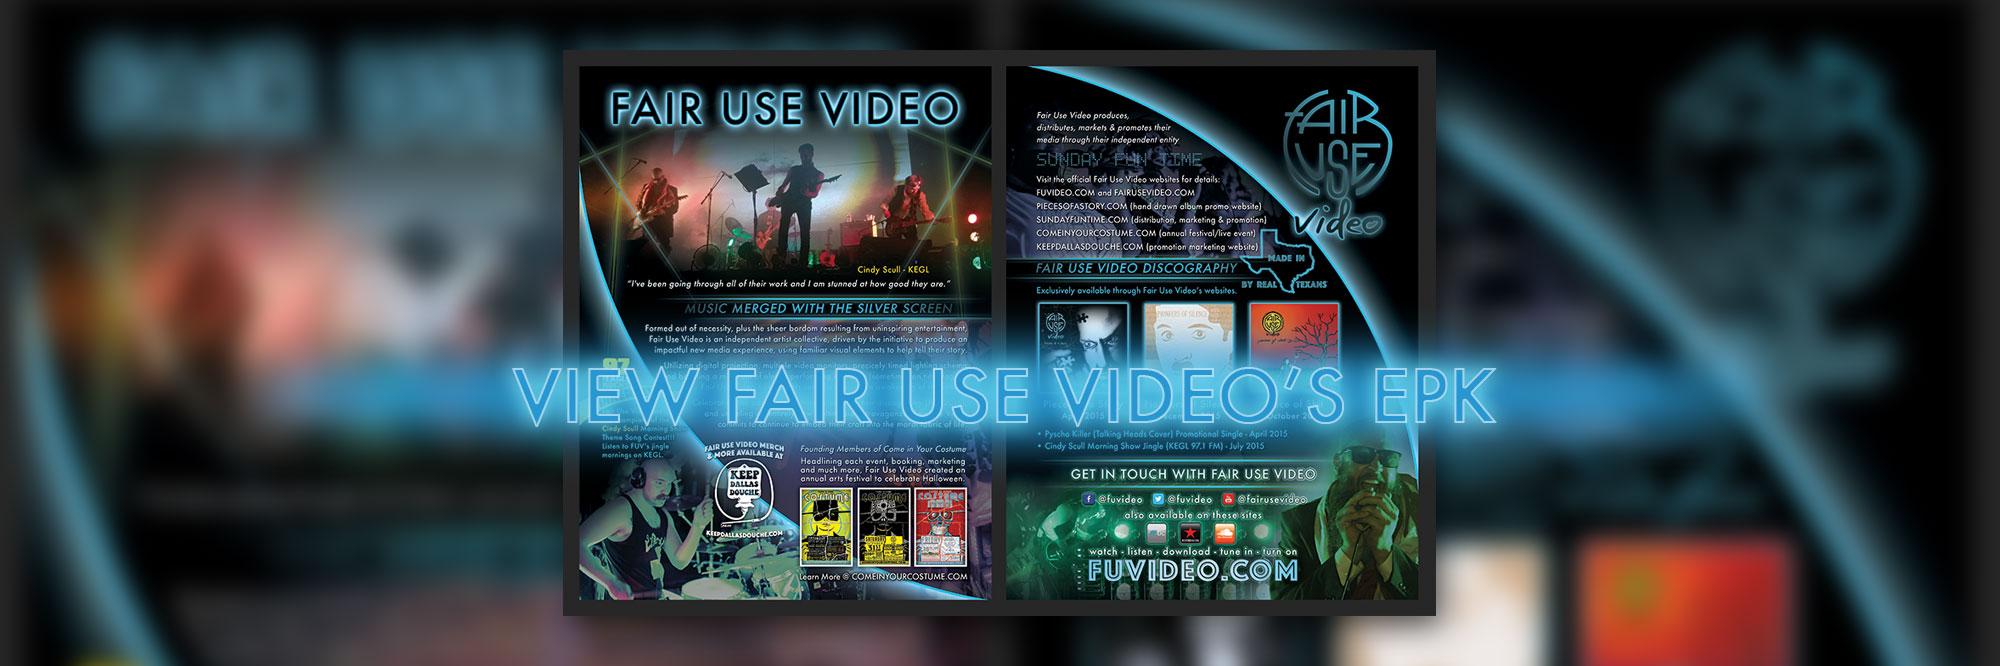 Fair Use Video EPK